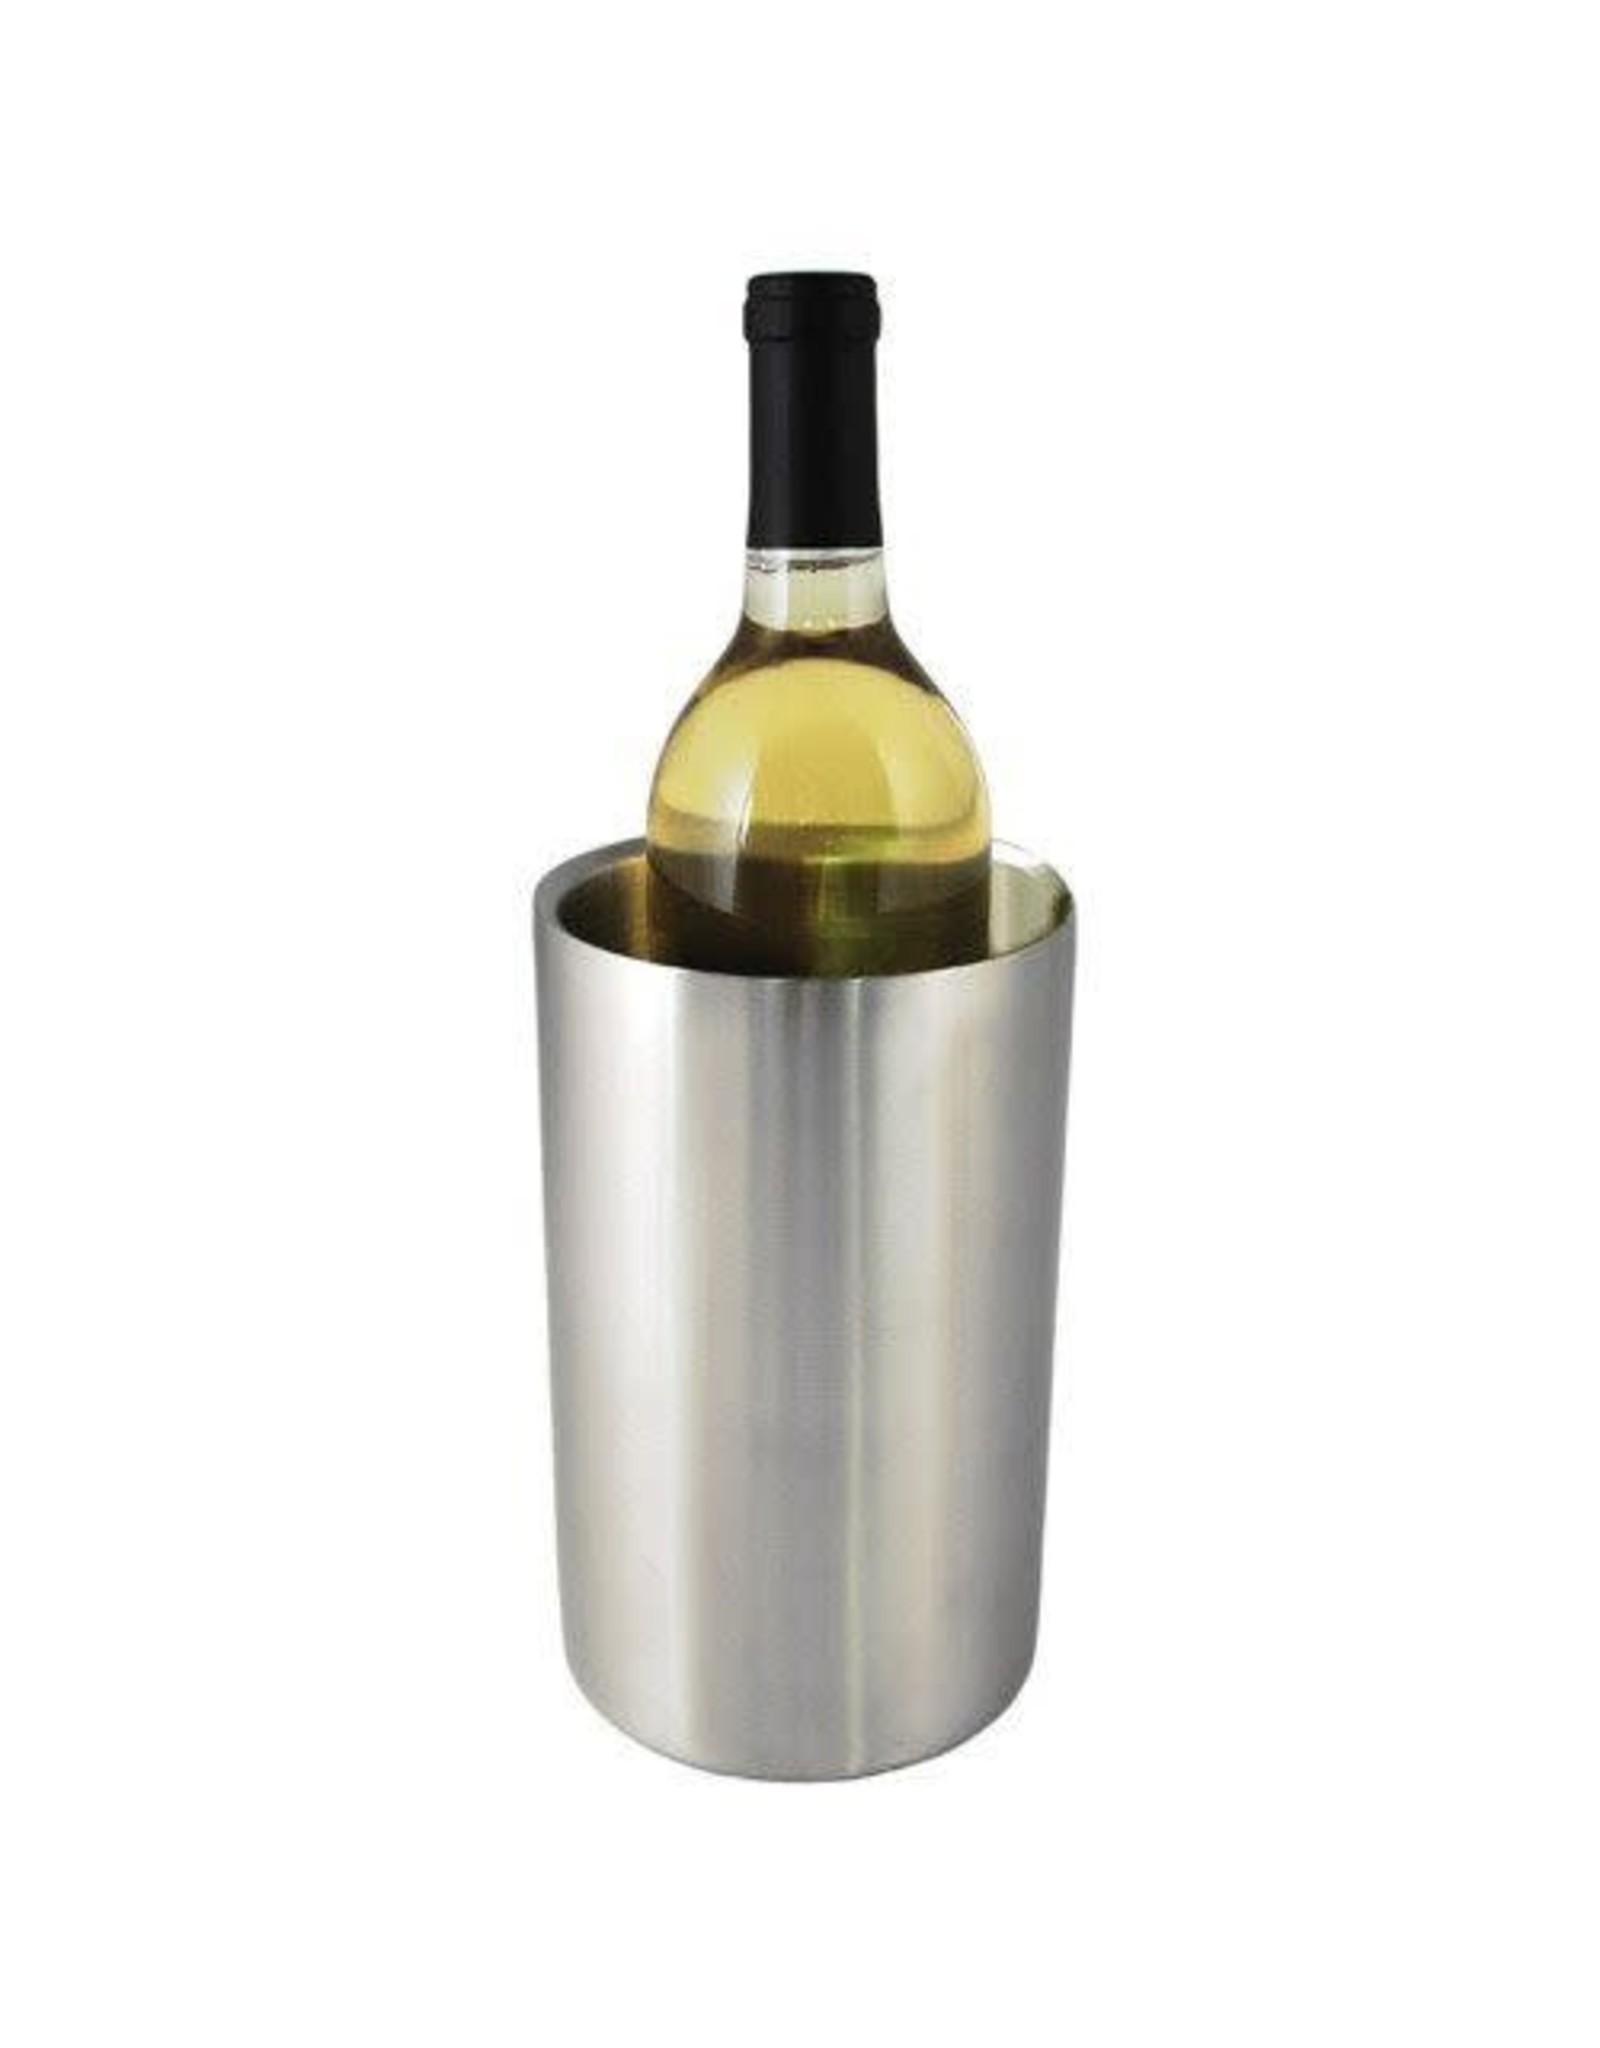 TRB Stainless Steel Wine Chiller